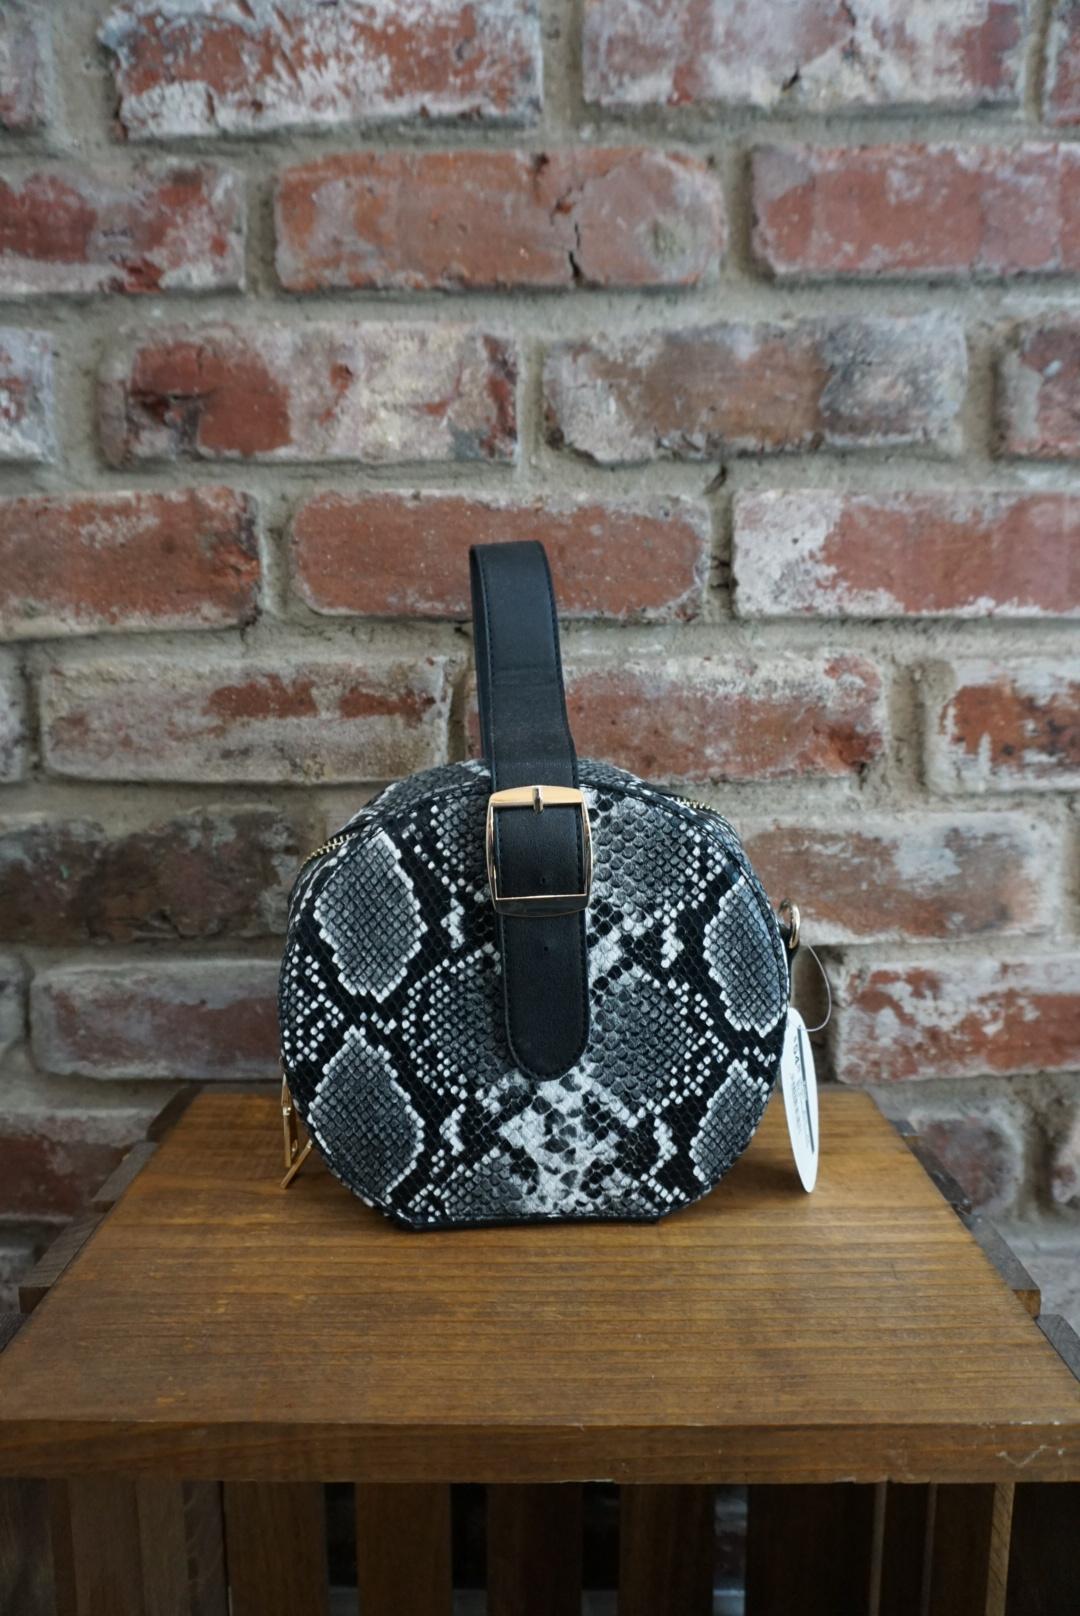 Mimi Wholesale Don't Snake Up On Me Handbag